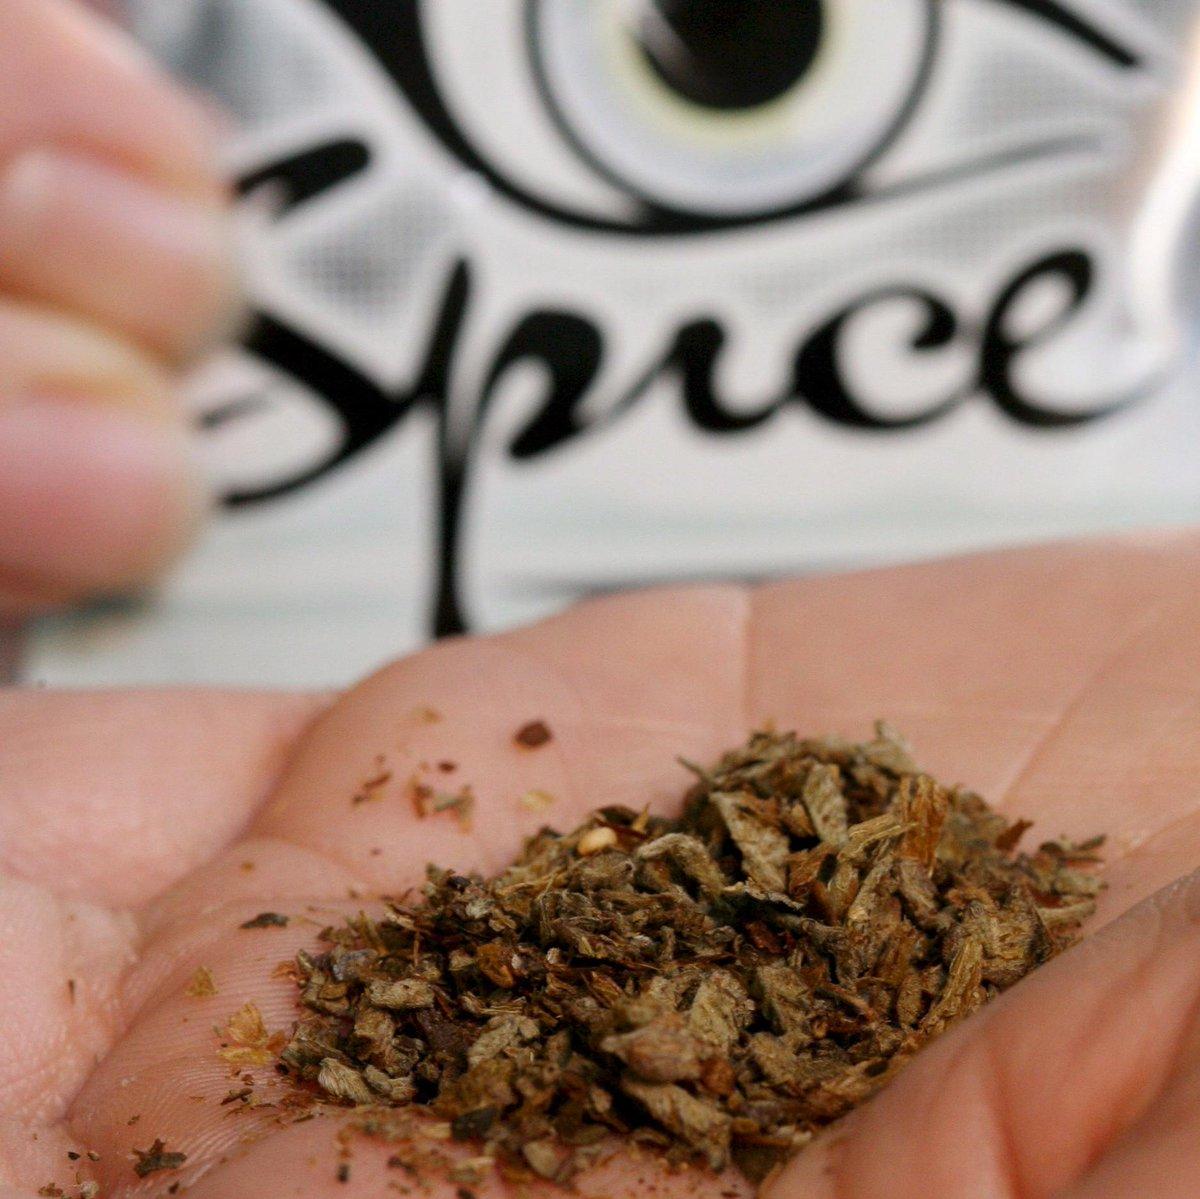 Спайс синтетическая марихуана семена конопли наркотической